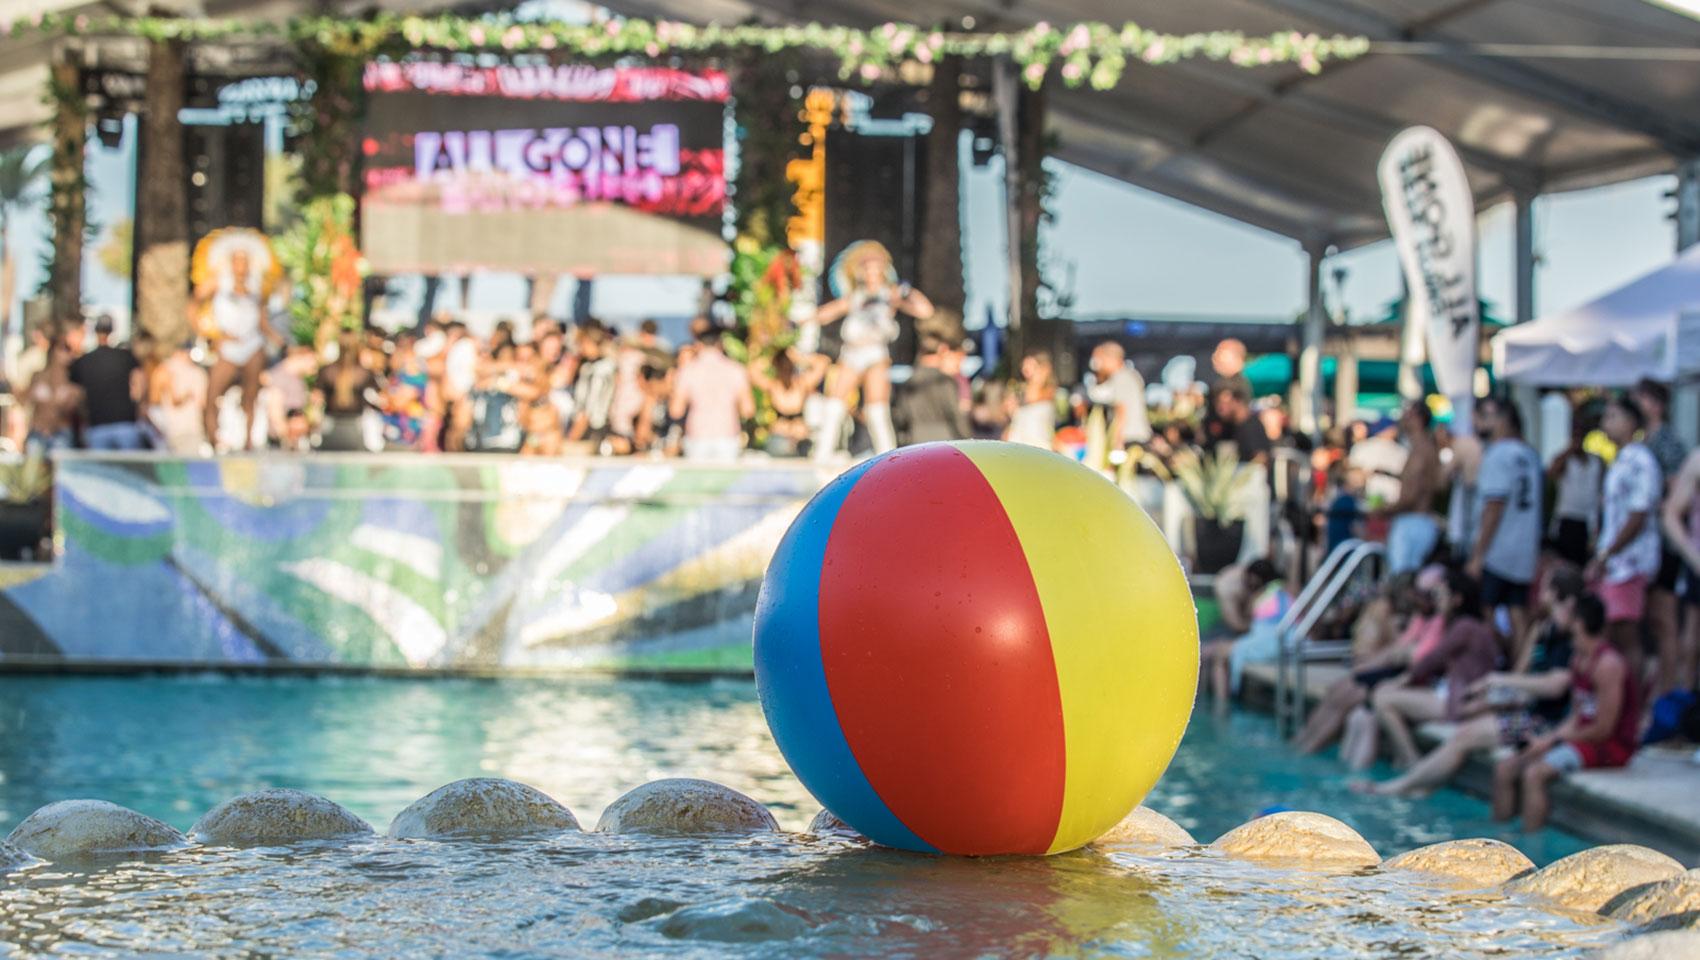 Miami Music Week + WMC Hotel Deals | Kimpton Surfcomber Hotel